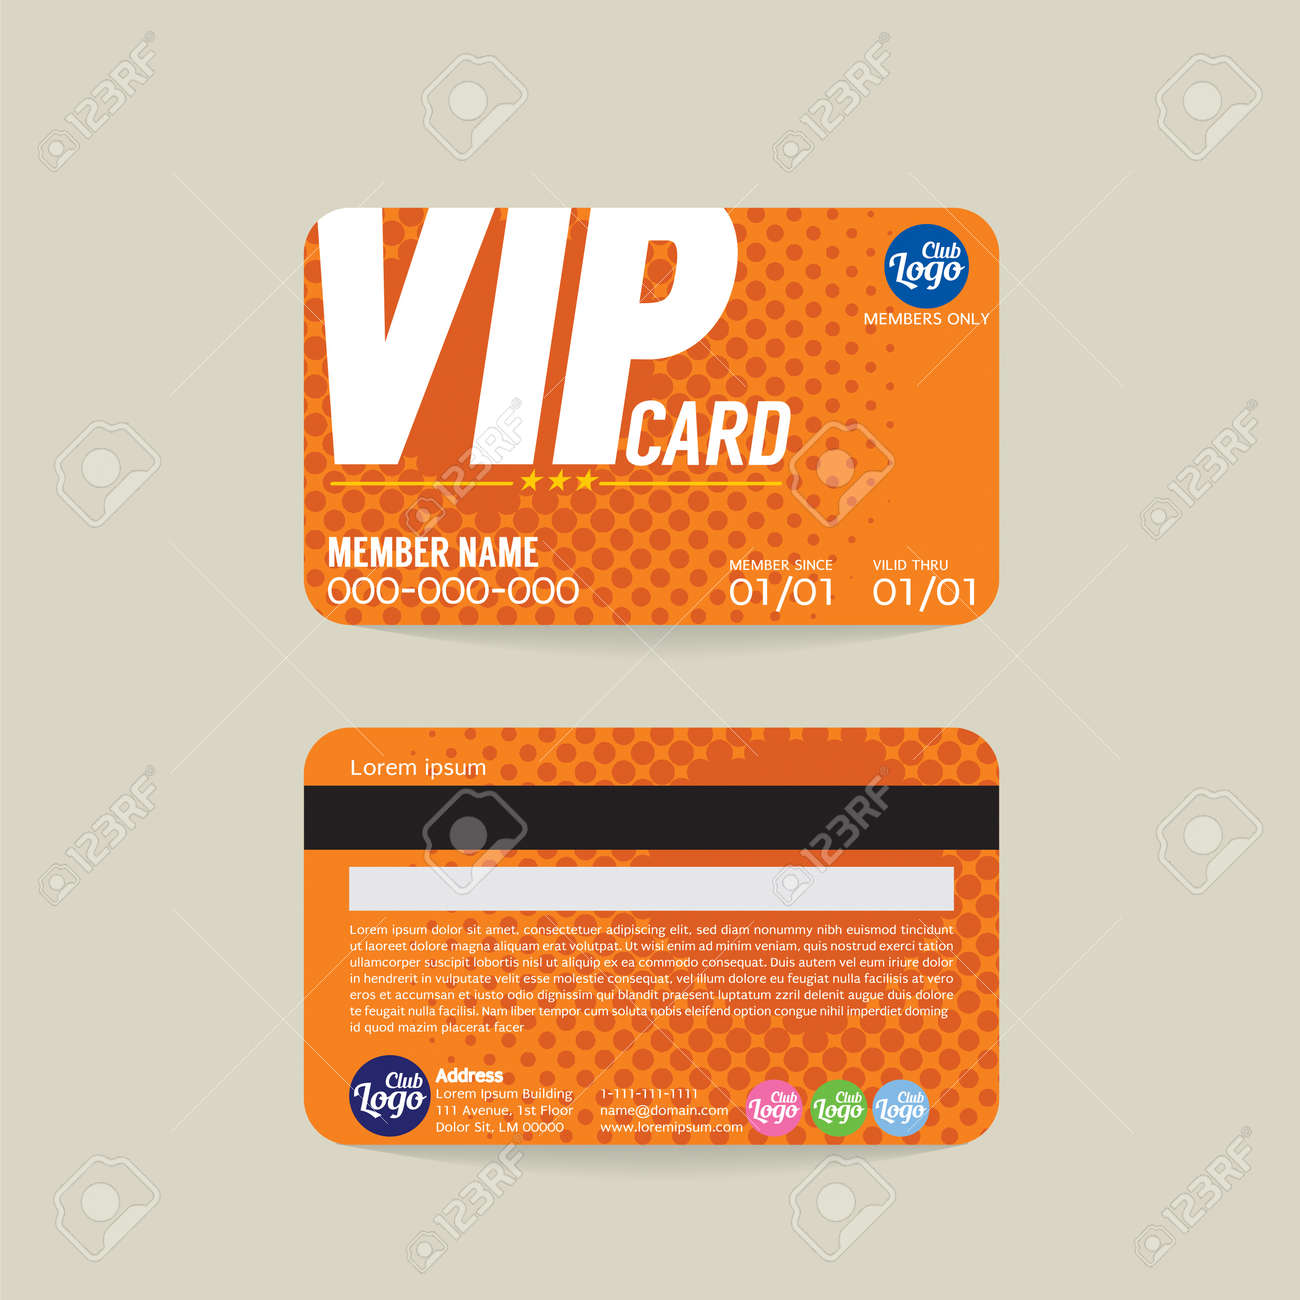 Membership Card Photos Images Royalty Free Membership Card – Membership Cards Template